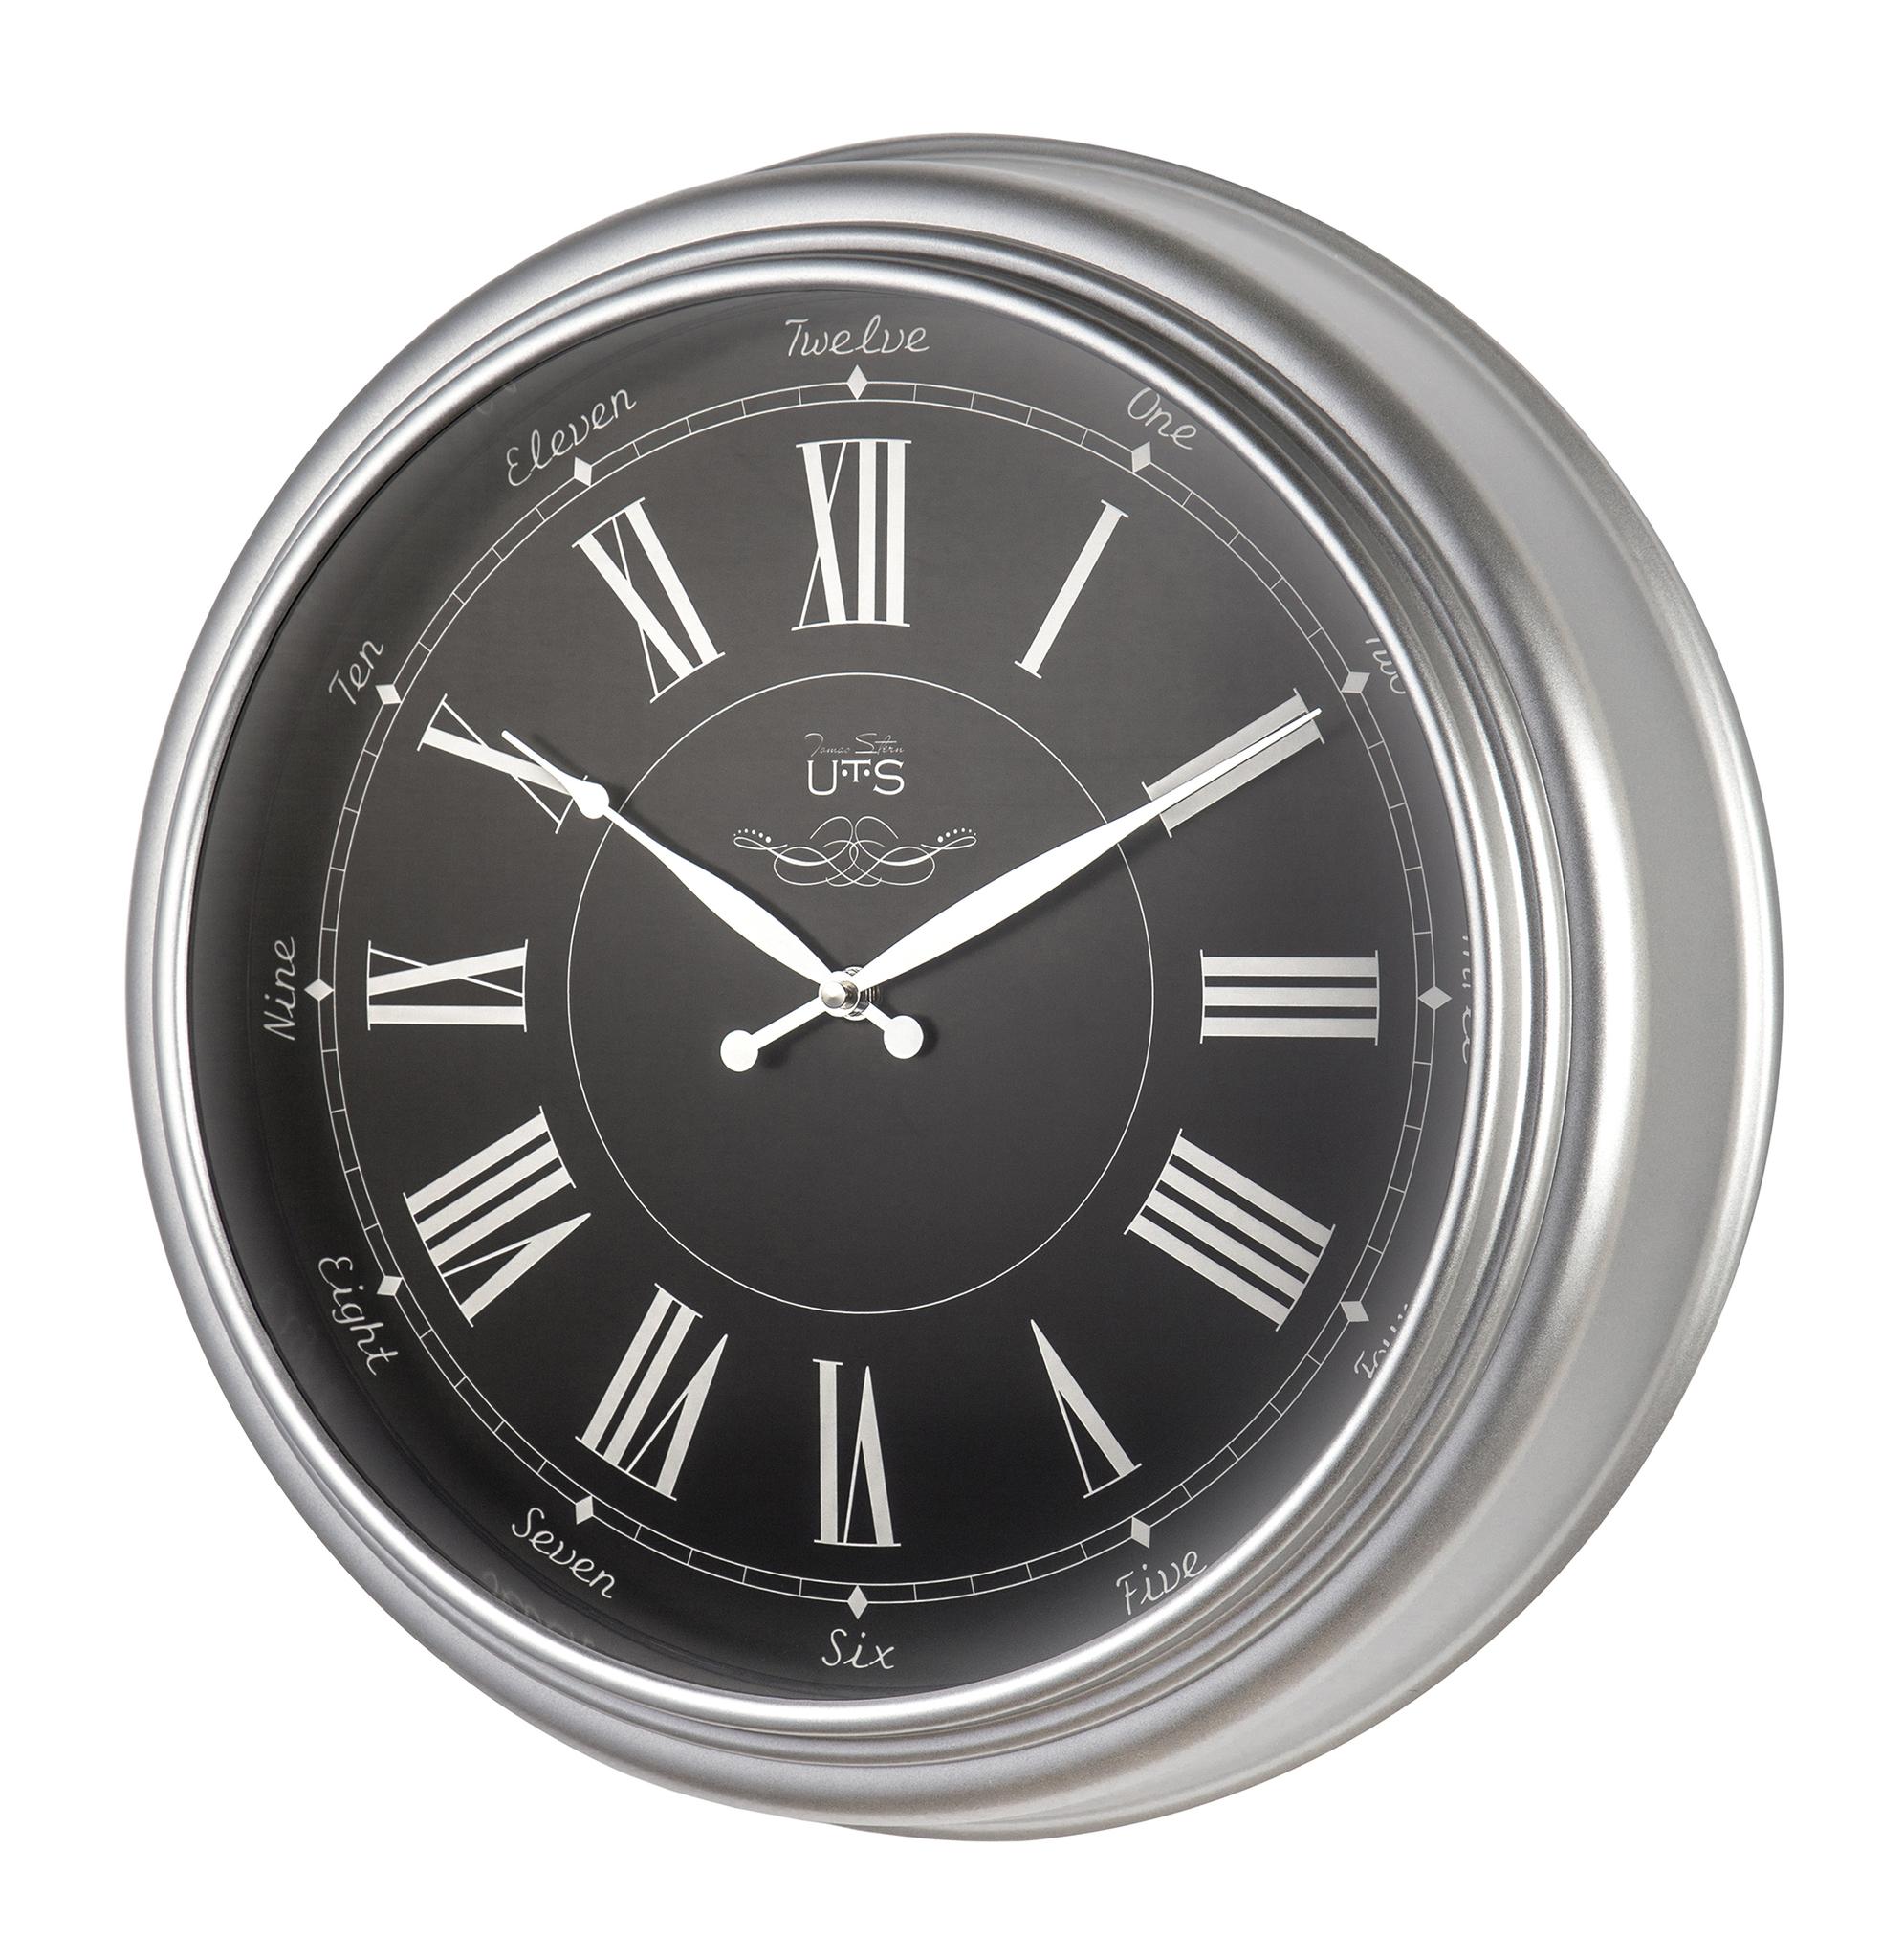 Часы настенные Часы настенные Tomas Stern 9026 chasy-nastennye-tomas-stern-9026-germaniya.jpg